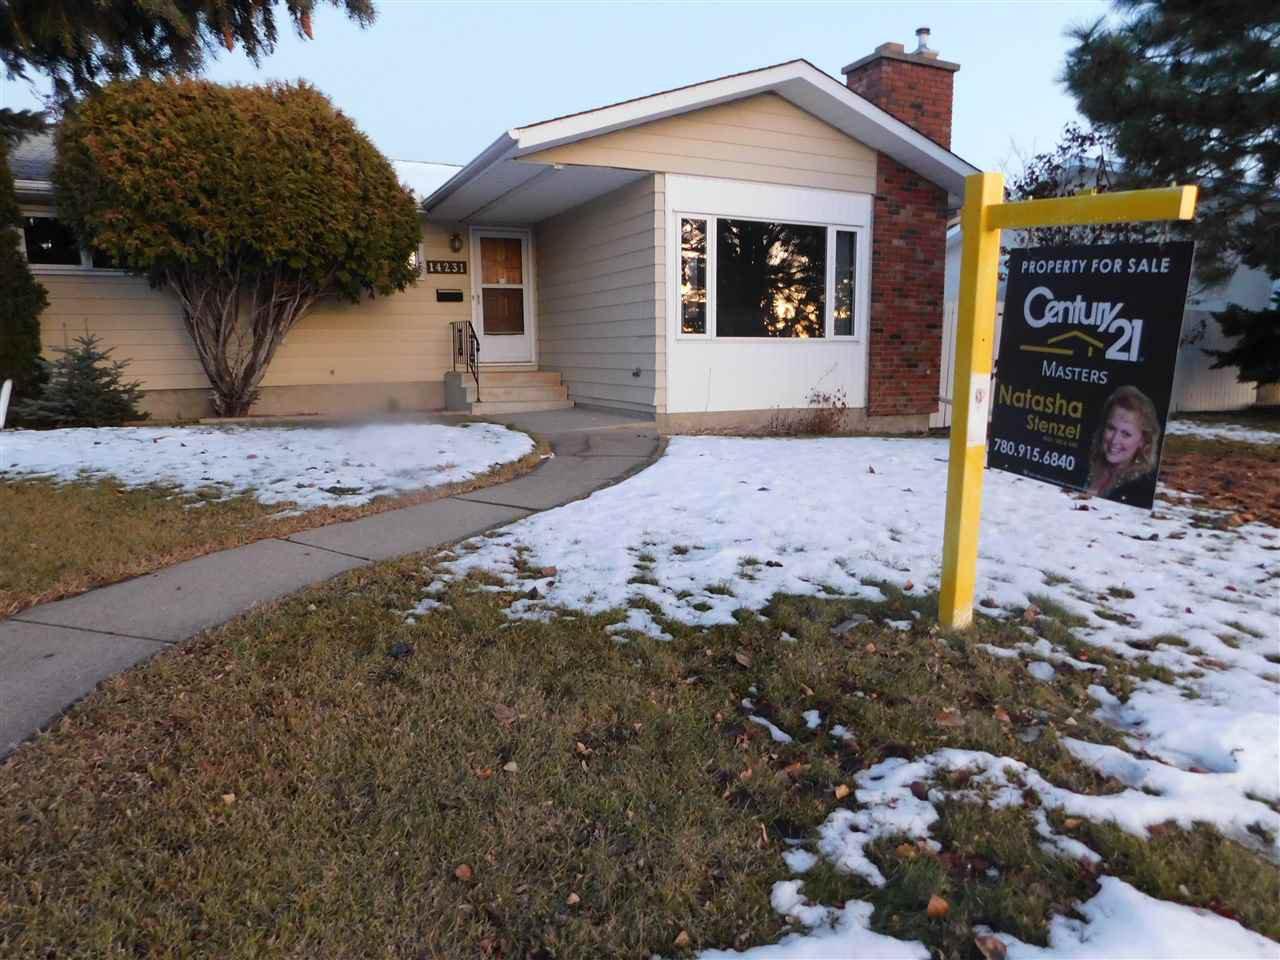 Main Photo: 14231 117 Street in Edmonton: Zone 27 House for sale : MLS®# E4180229